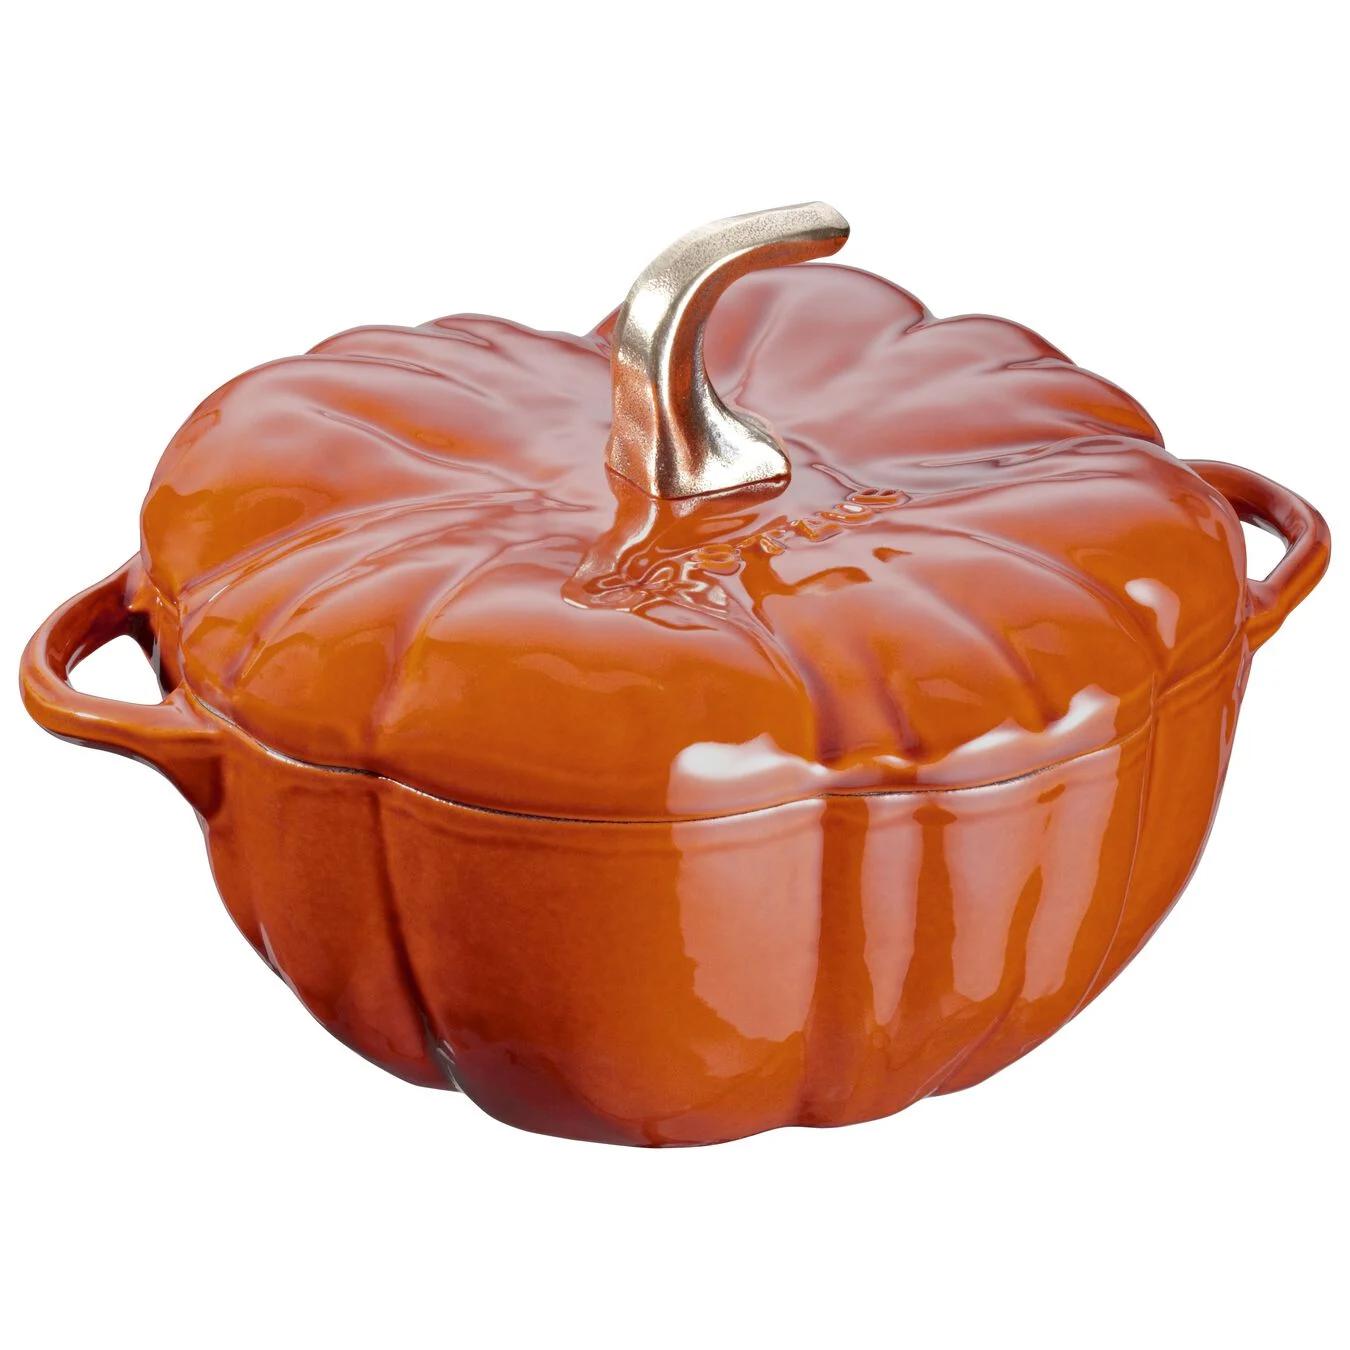 orange pumpkin-shaped Dutch oven on white background